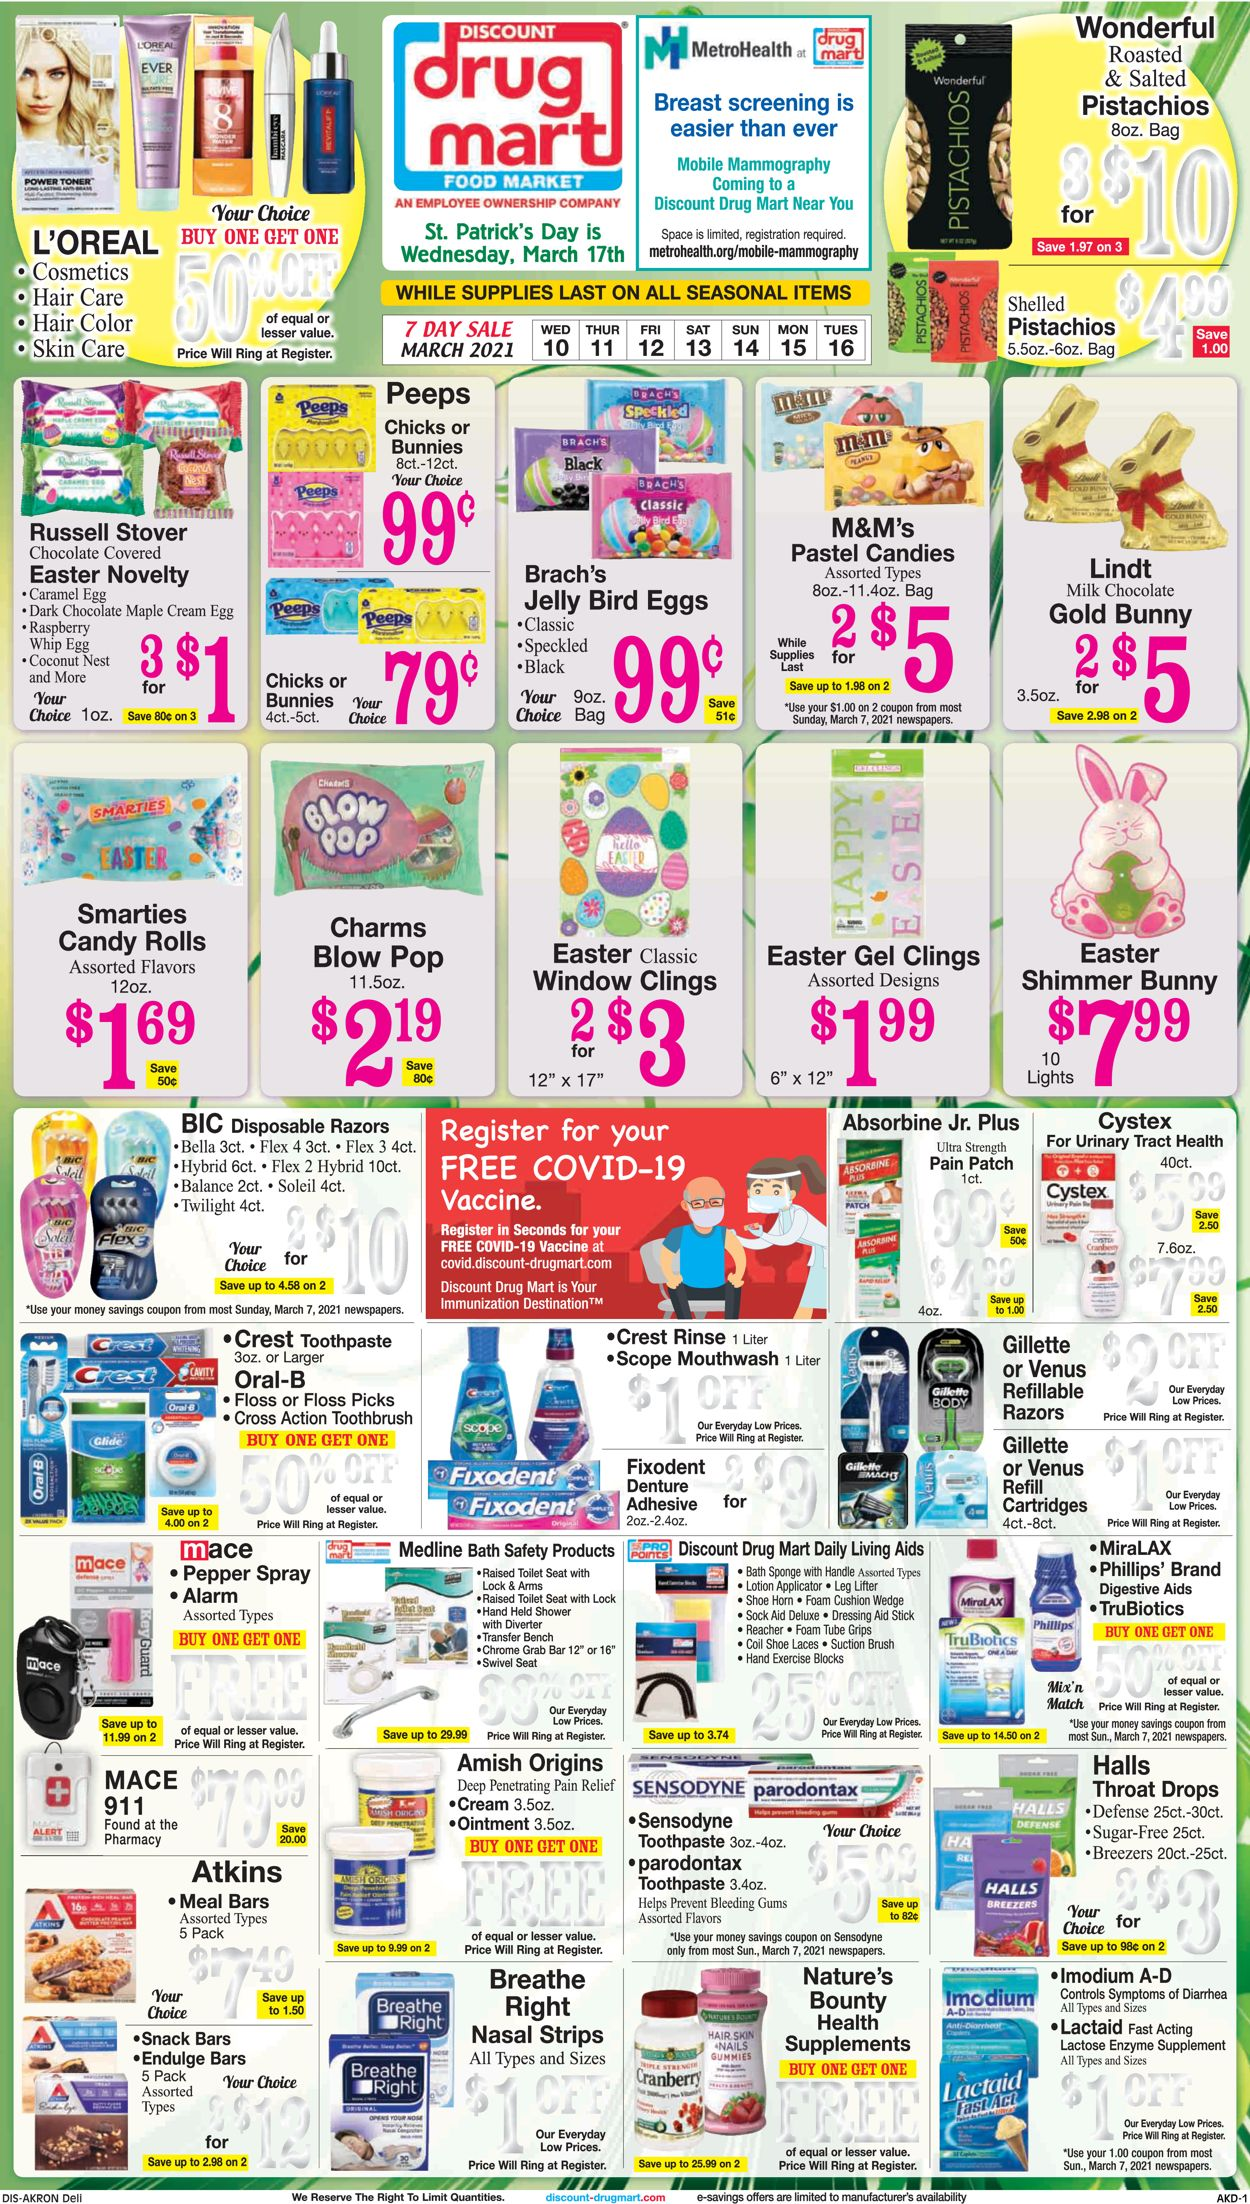 Discount Drug Mart Weekly Ad Circular - valid 03/10-03/16/2021